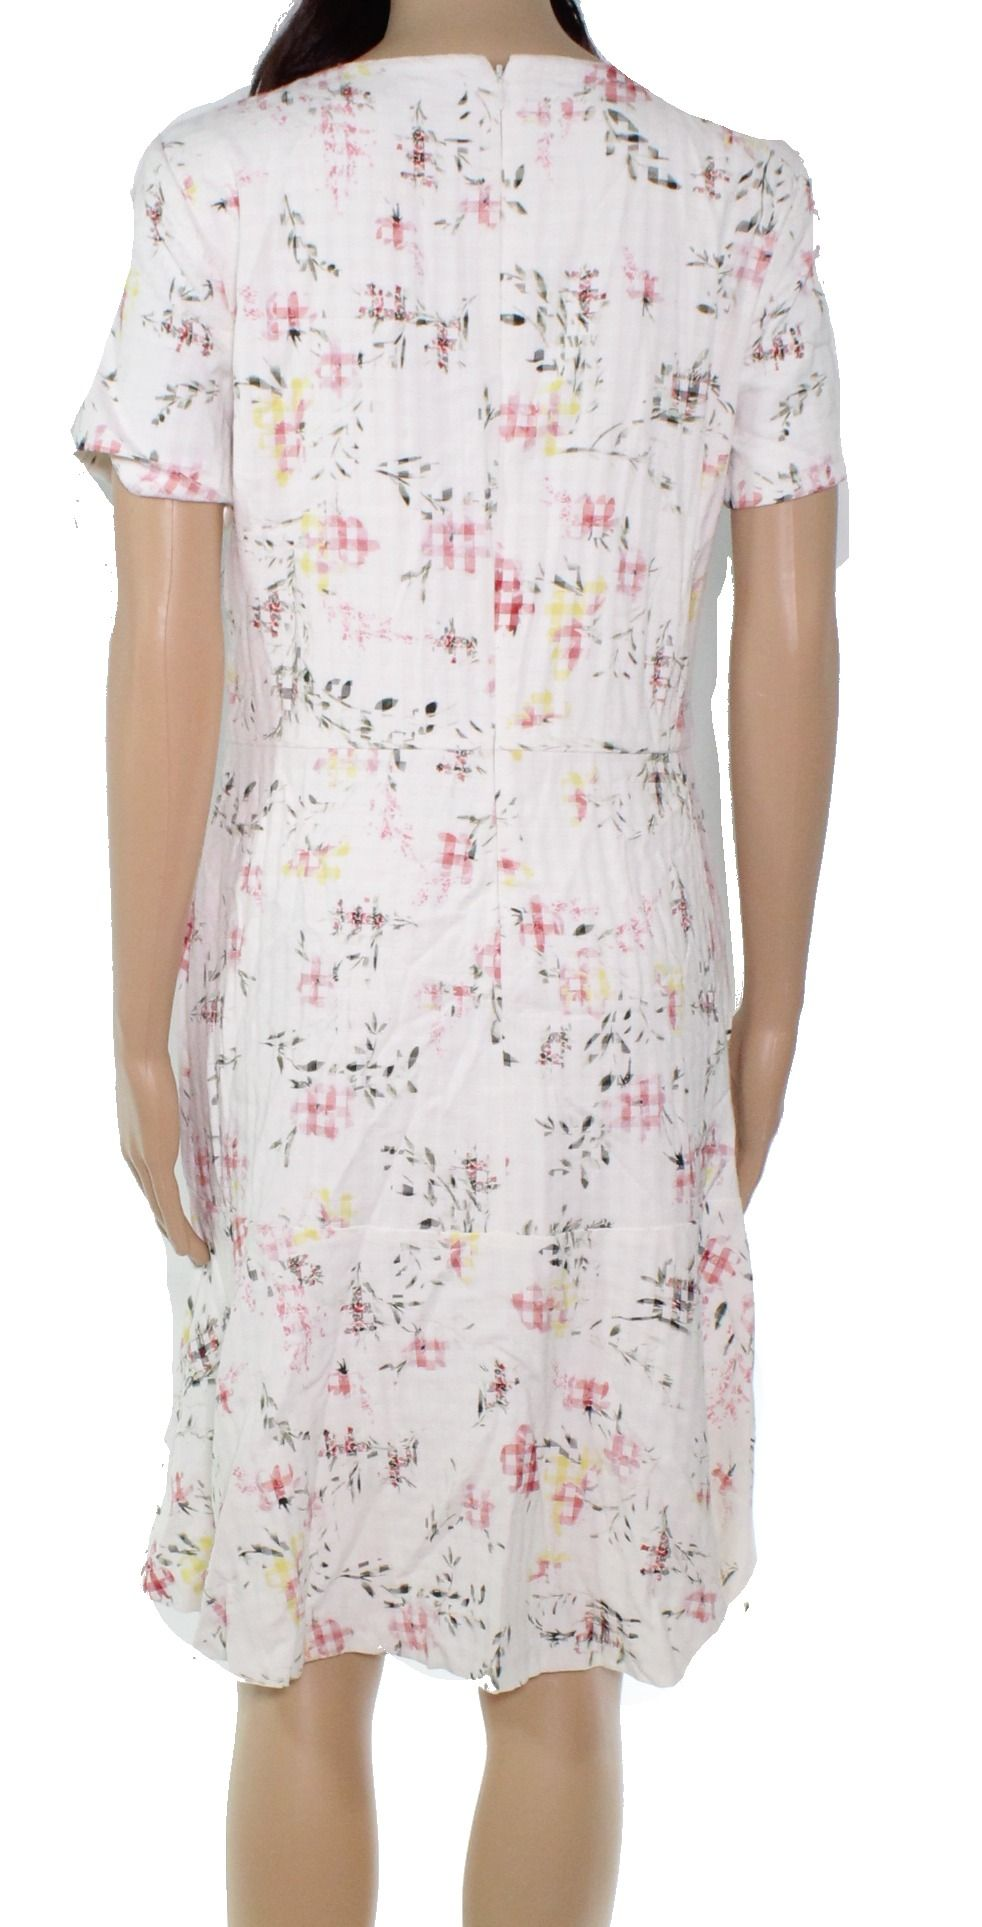 Lauren By Ralph Lauren Women's White Ivory Size 8 Floral A-Line Dress